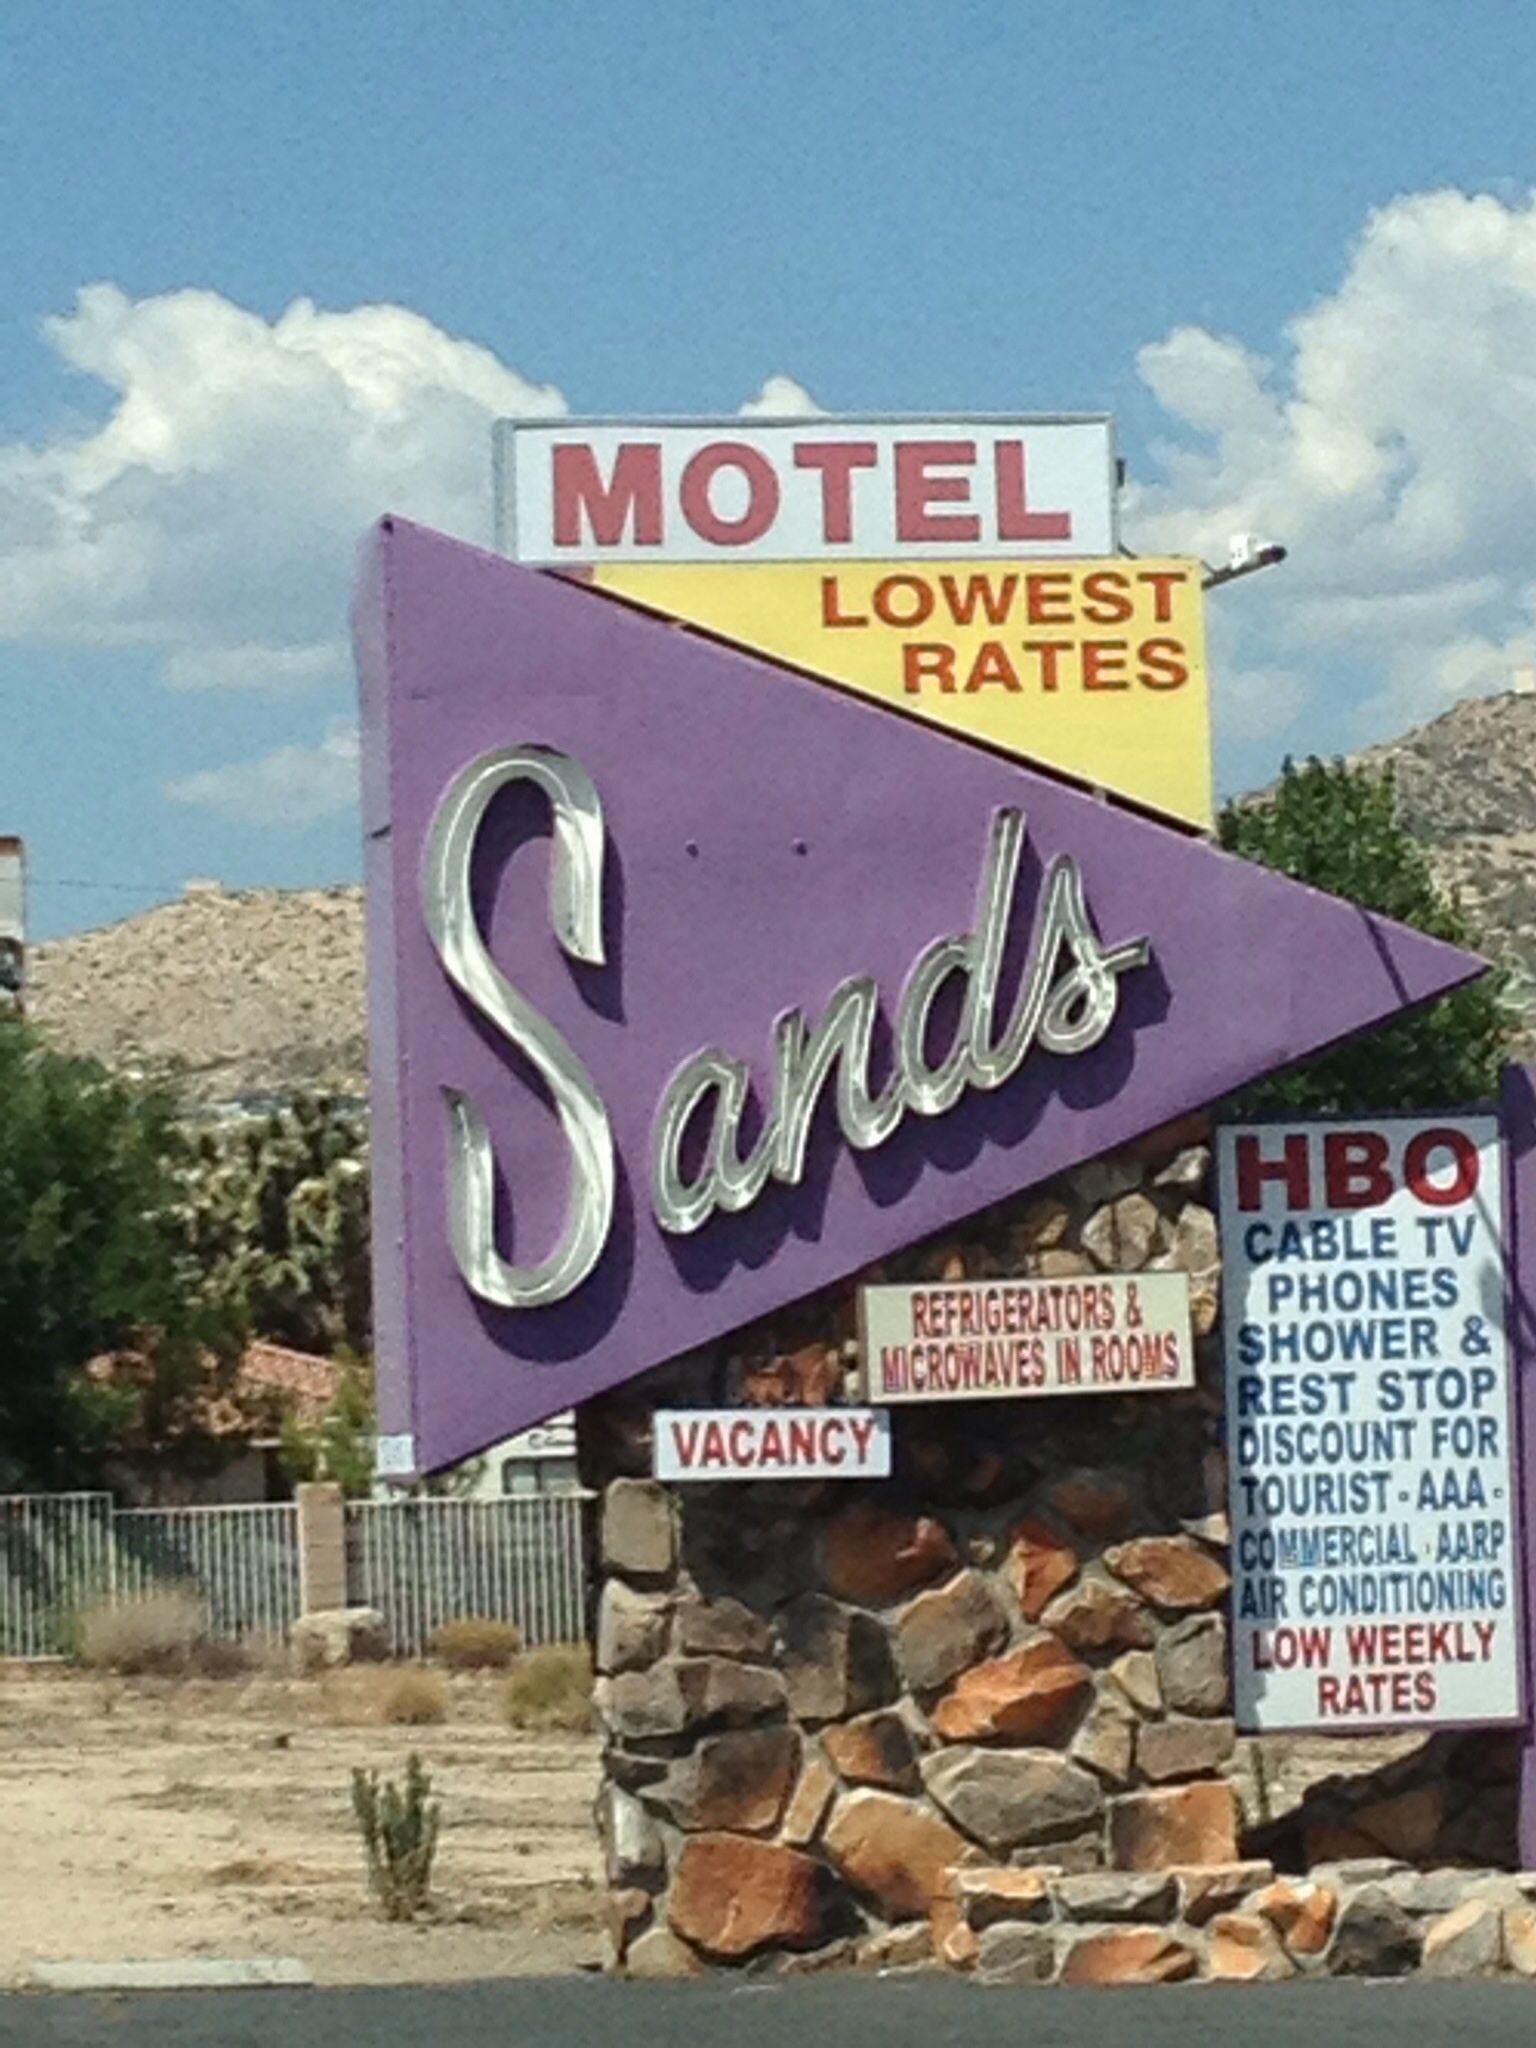 Yucca Valley, CA Yucca valley, Desert homes, Hot desert